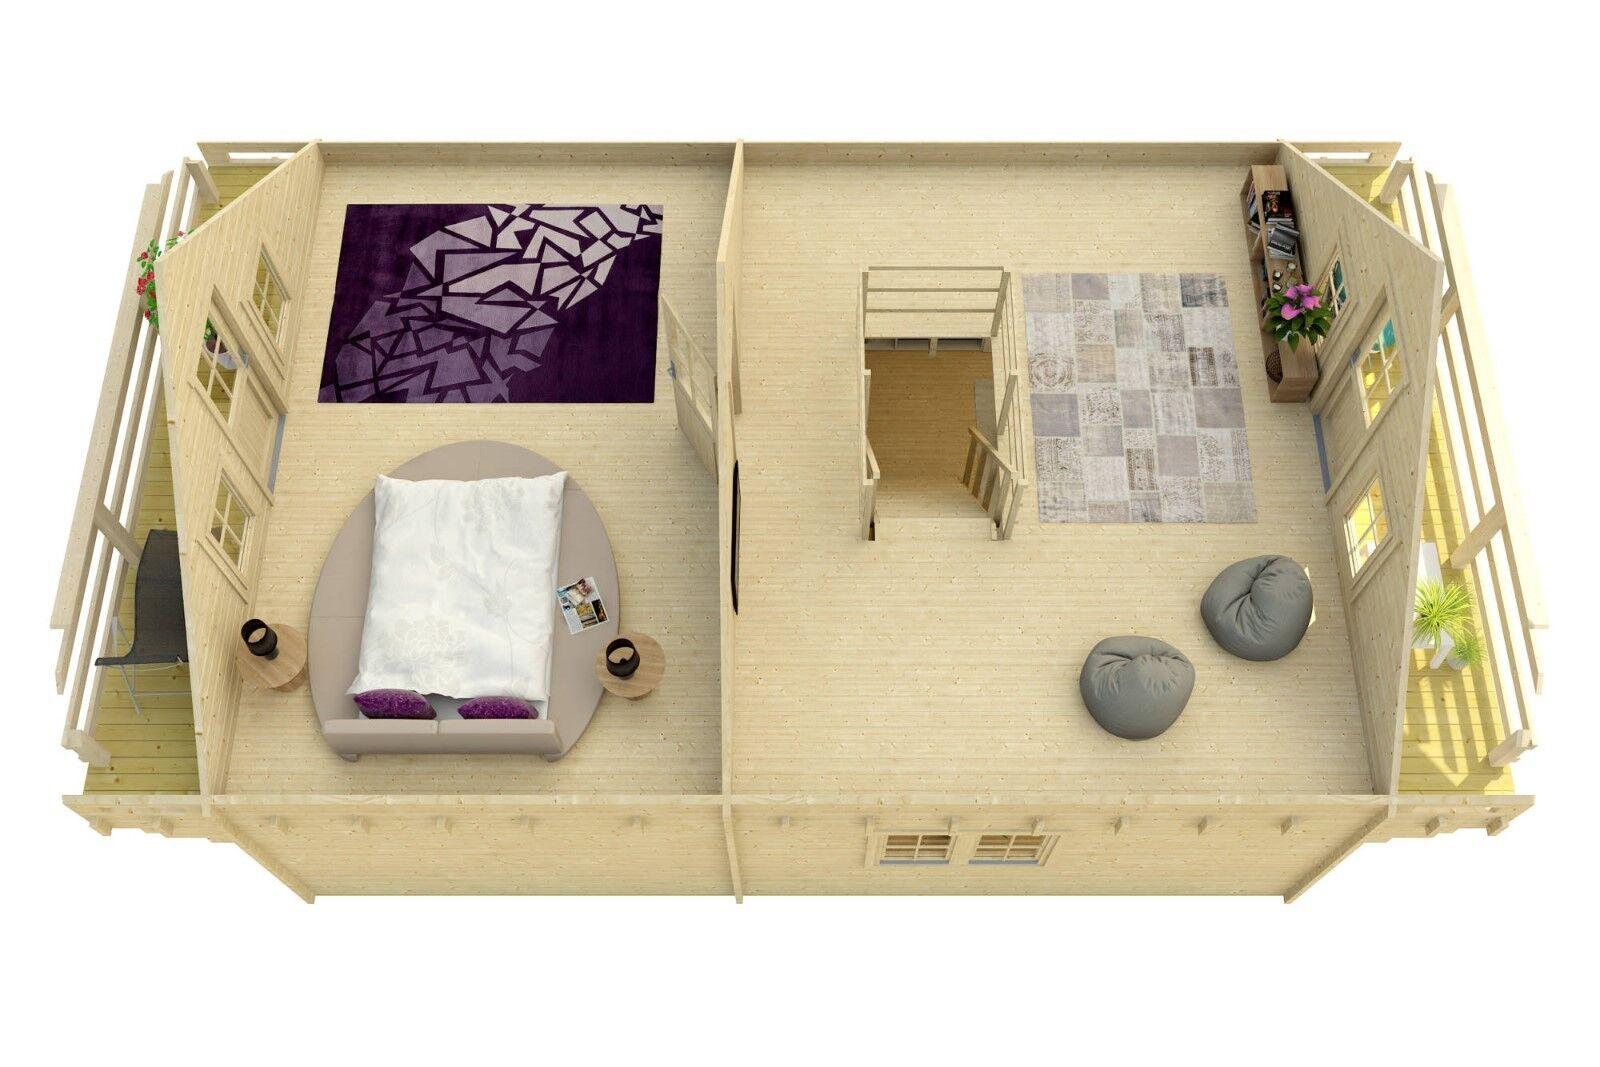 1000sq ft 19'x34'split level Log Cabin guest vacation pool house DIYBuilding Kit